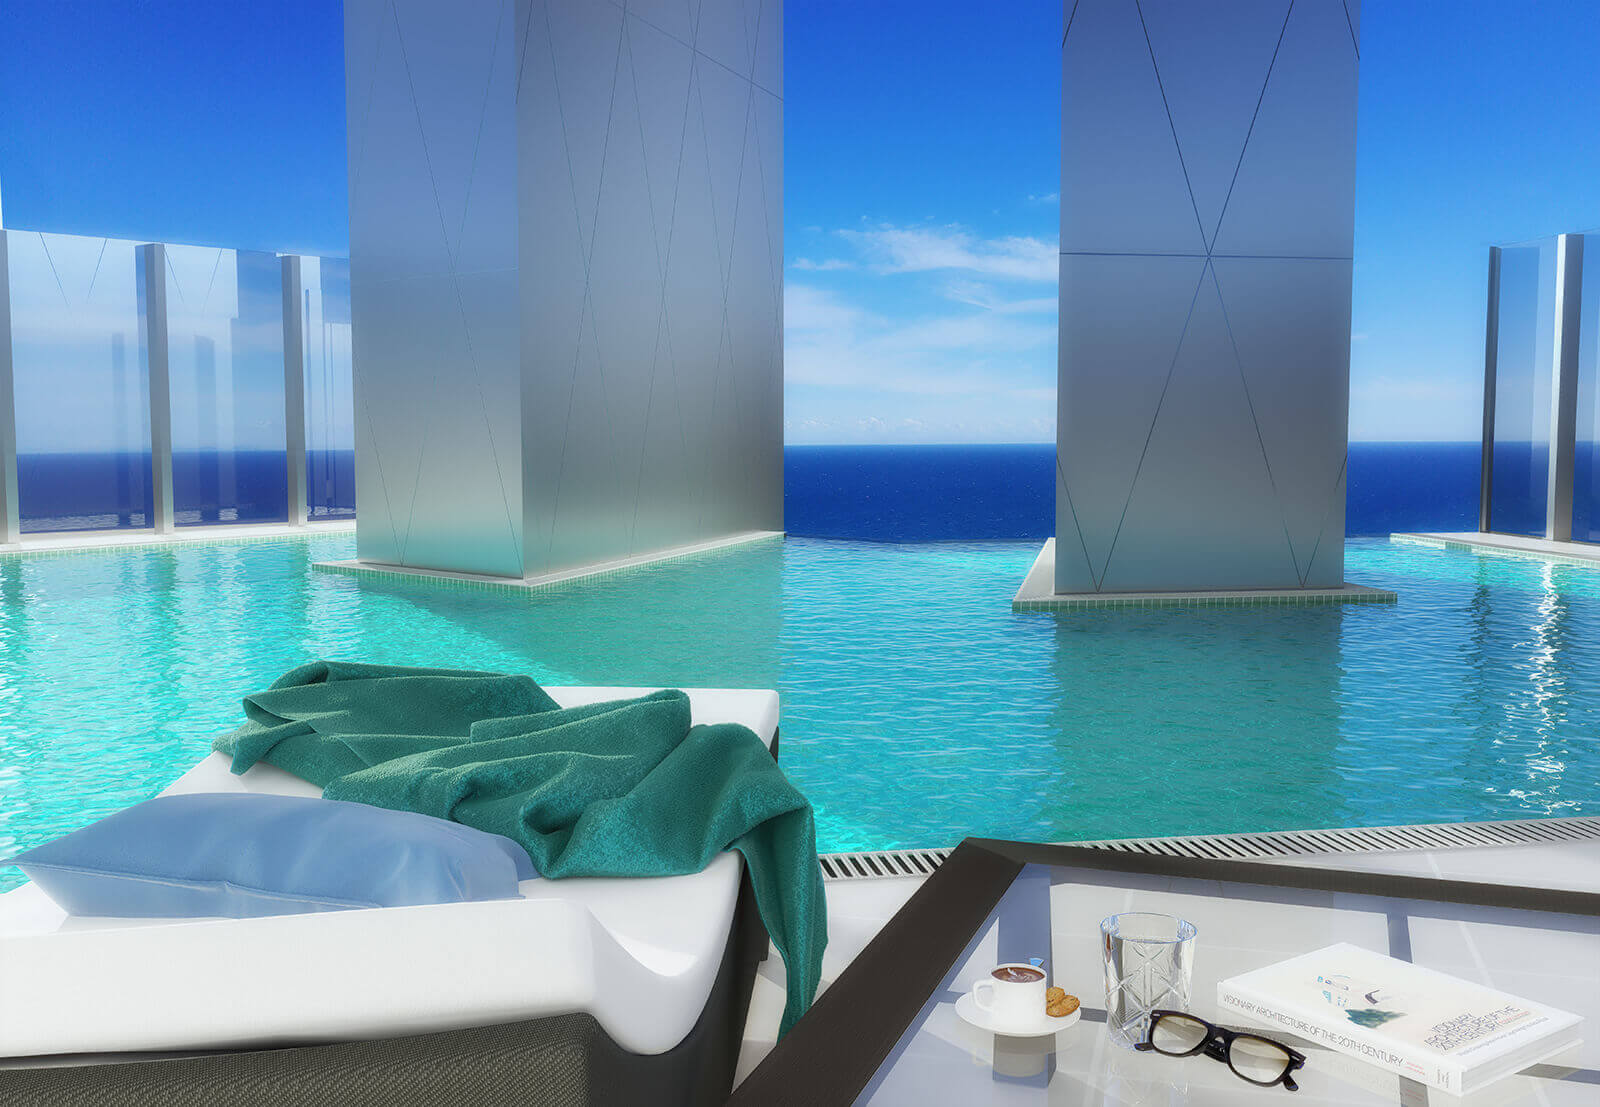 borderless swimming pool 3d exterior render